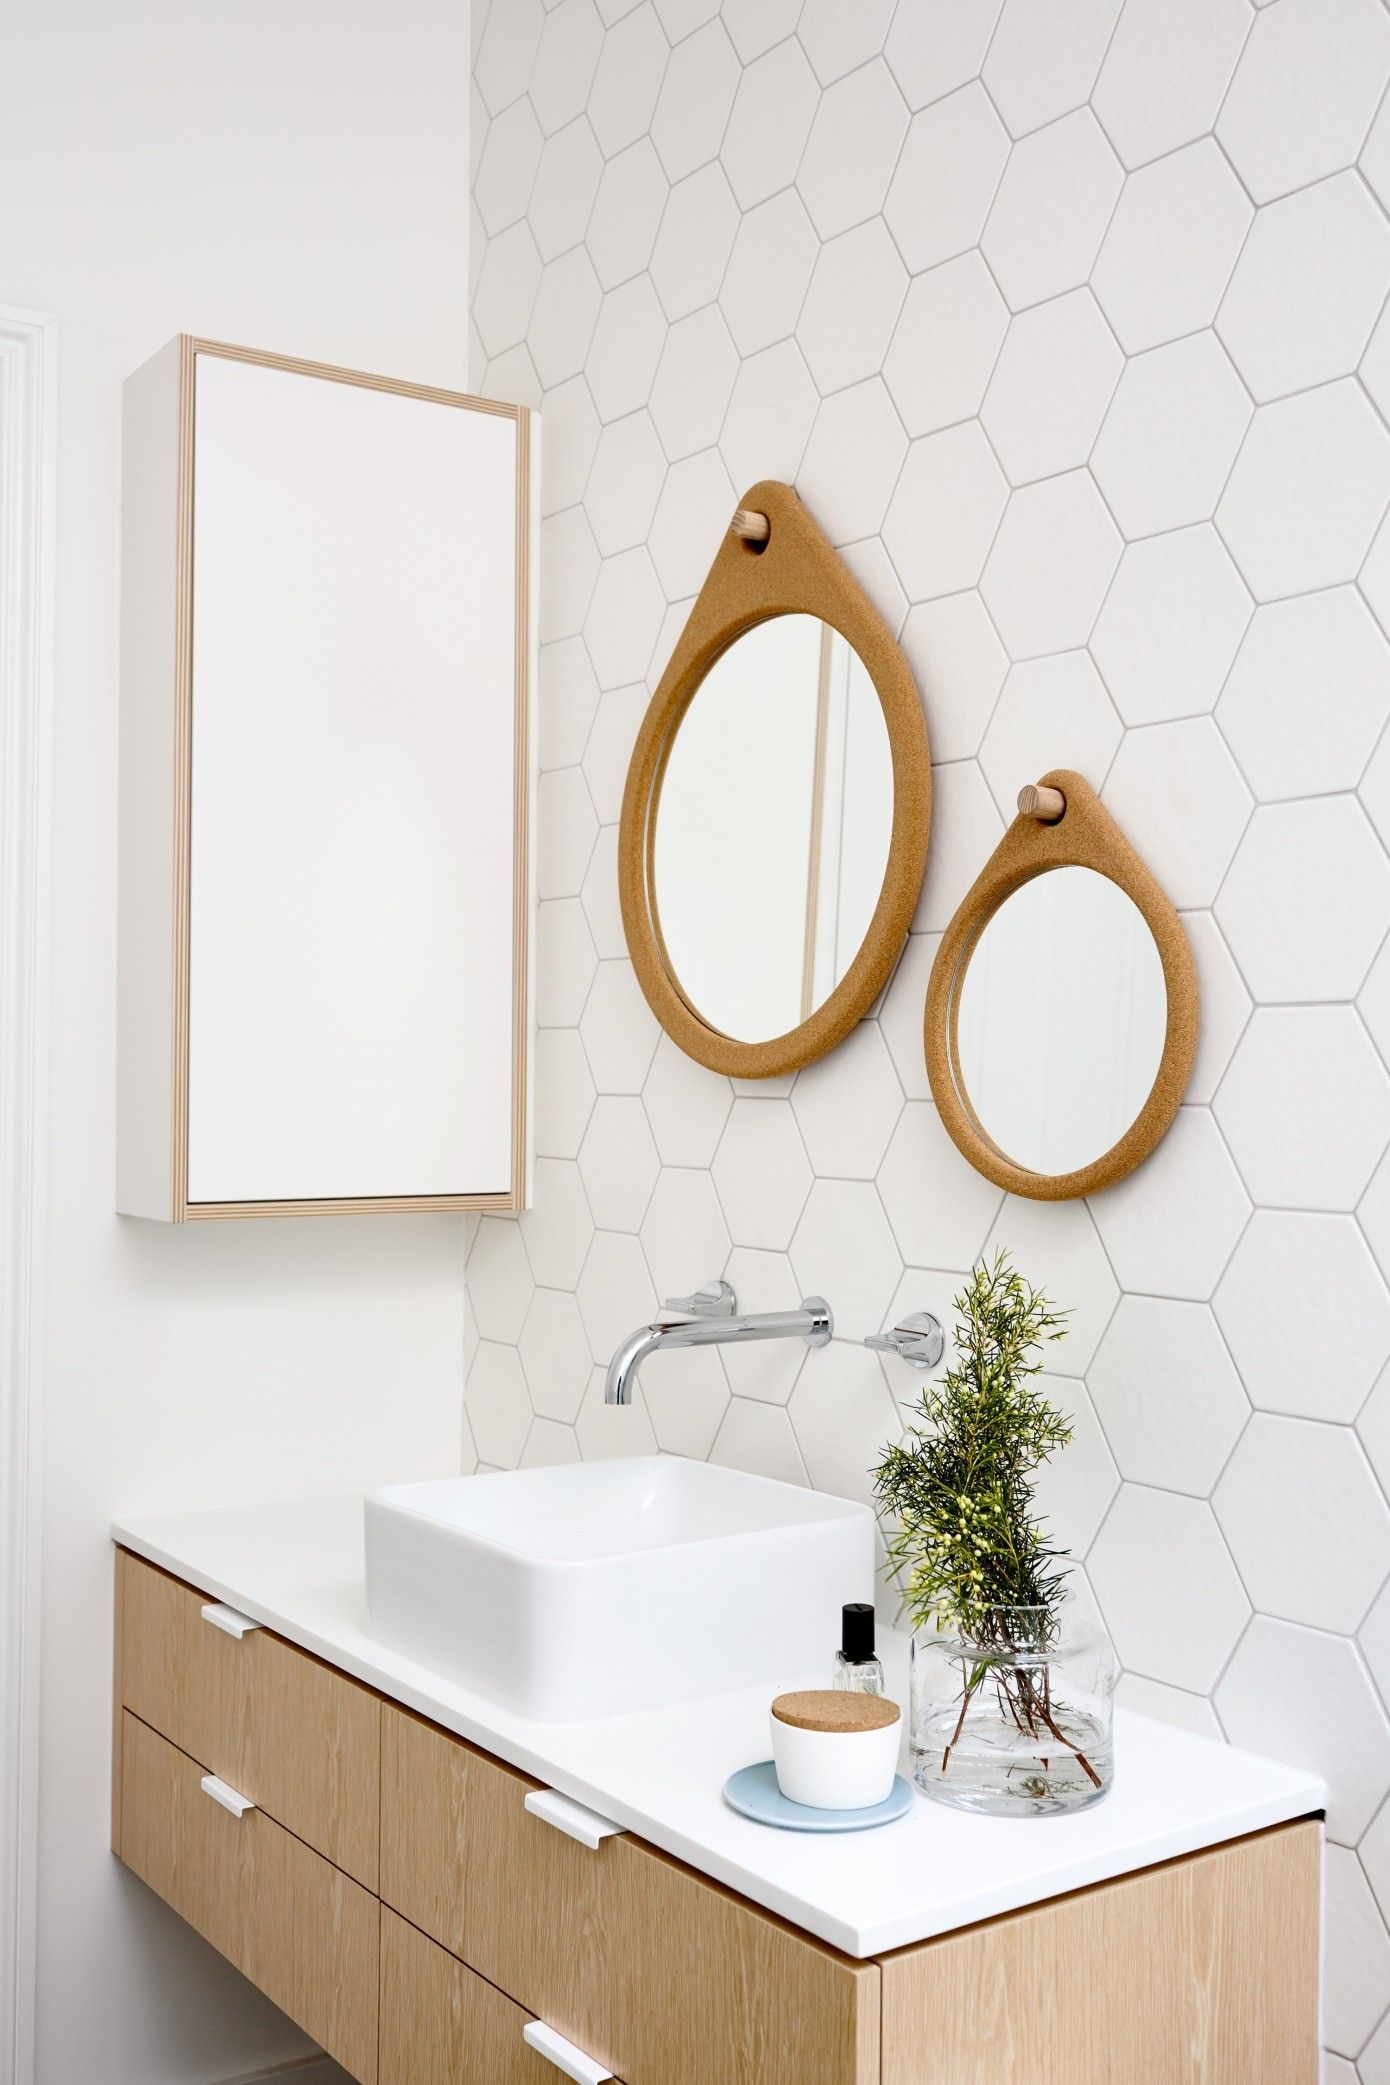 010-sandringham-residence-techn-architecture-interior-design | HomeAdore